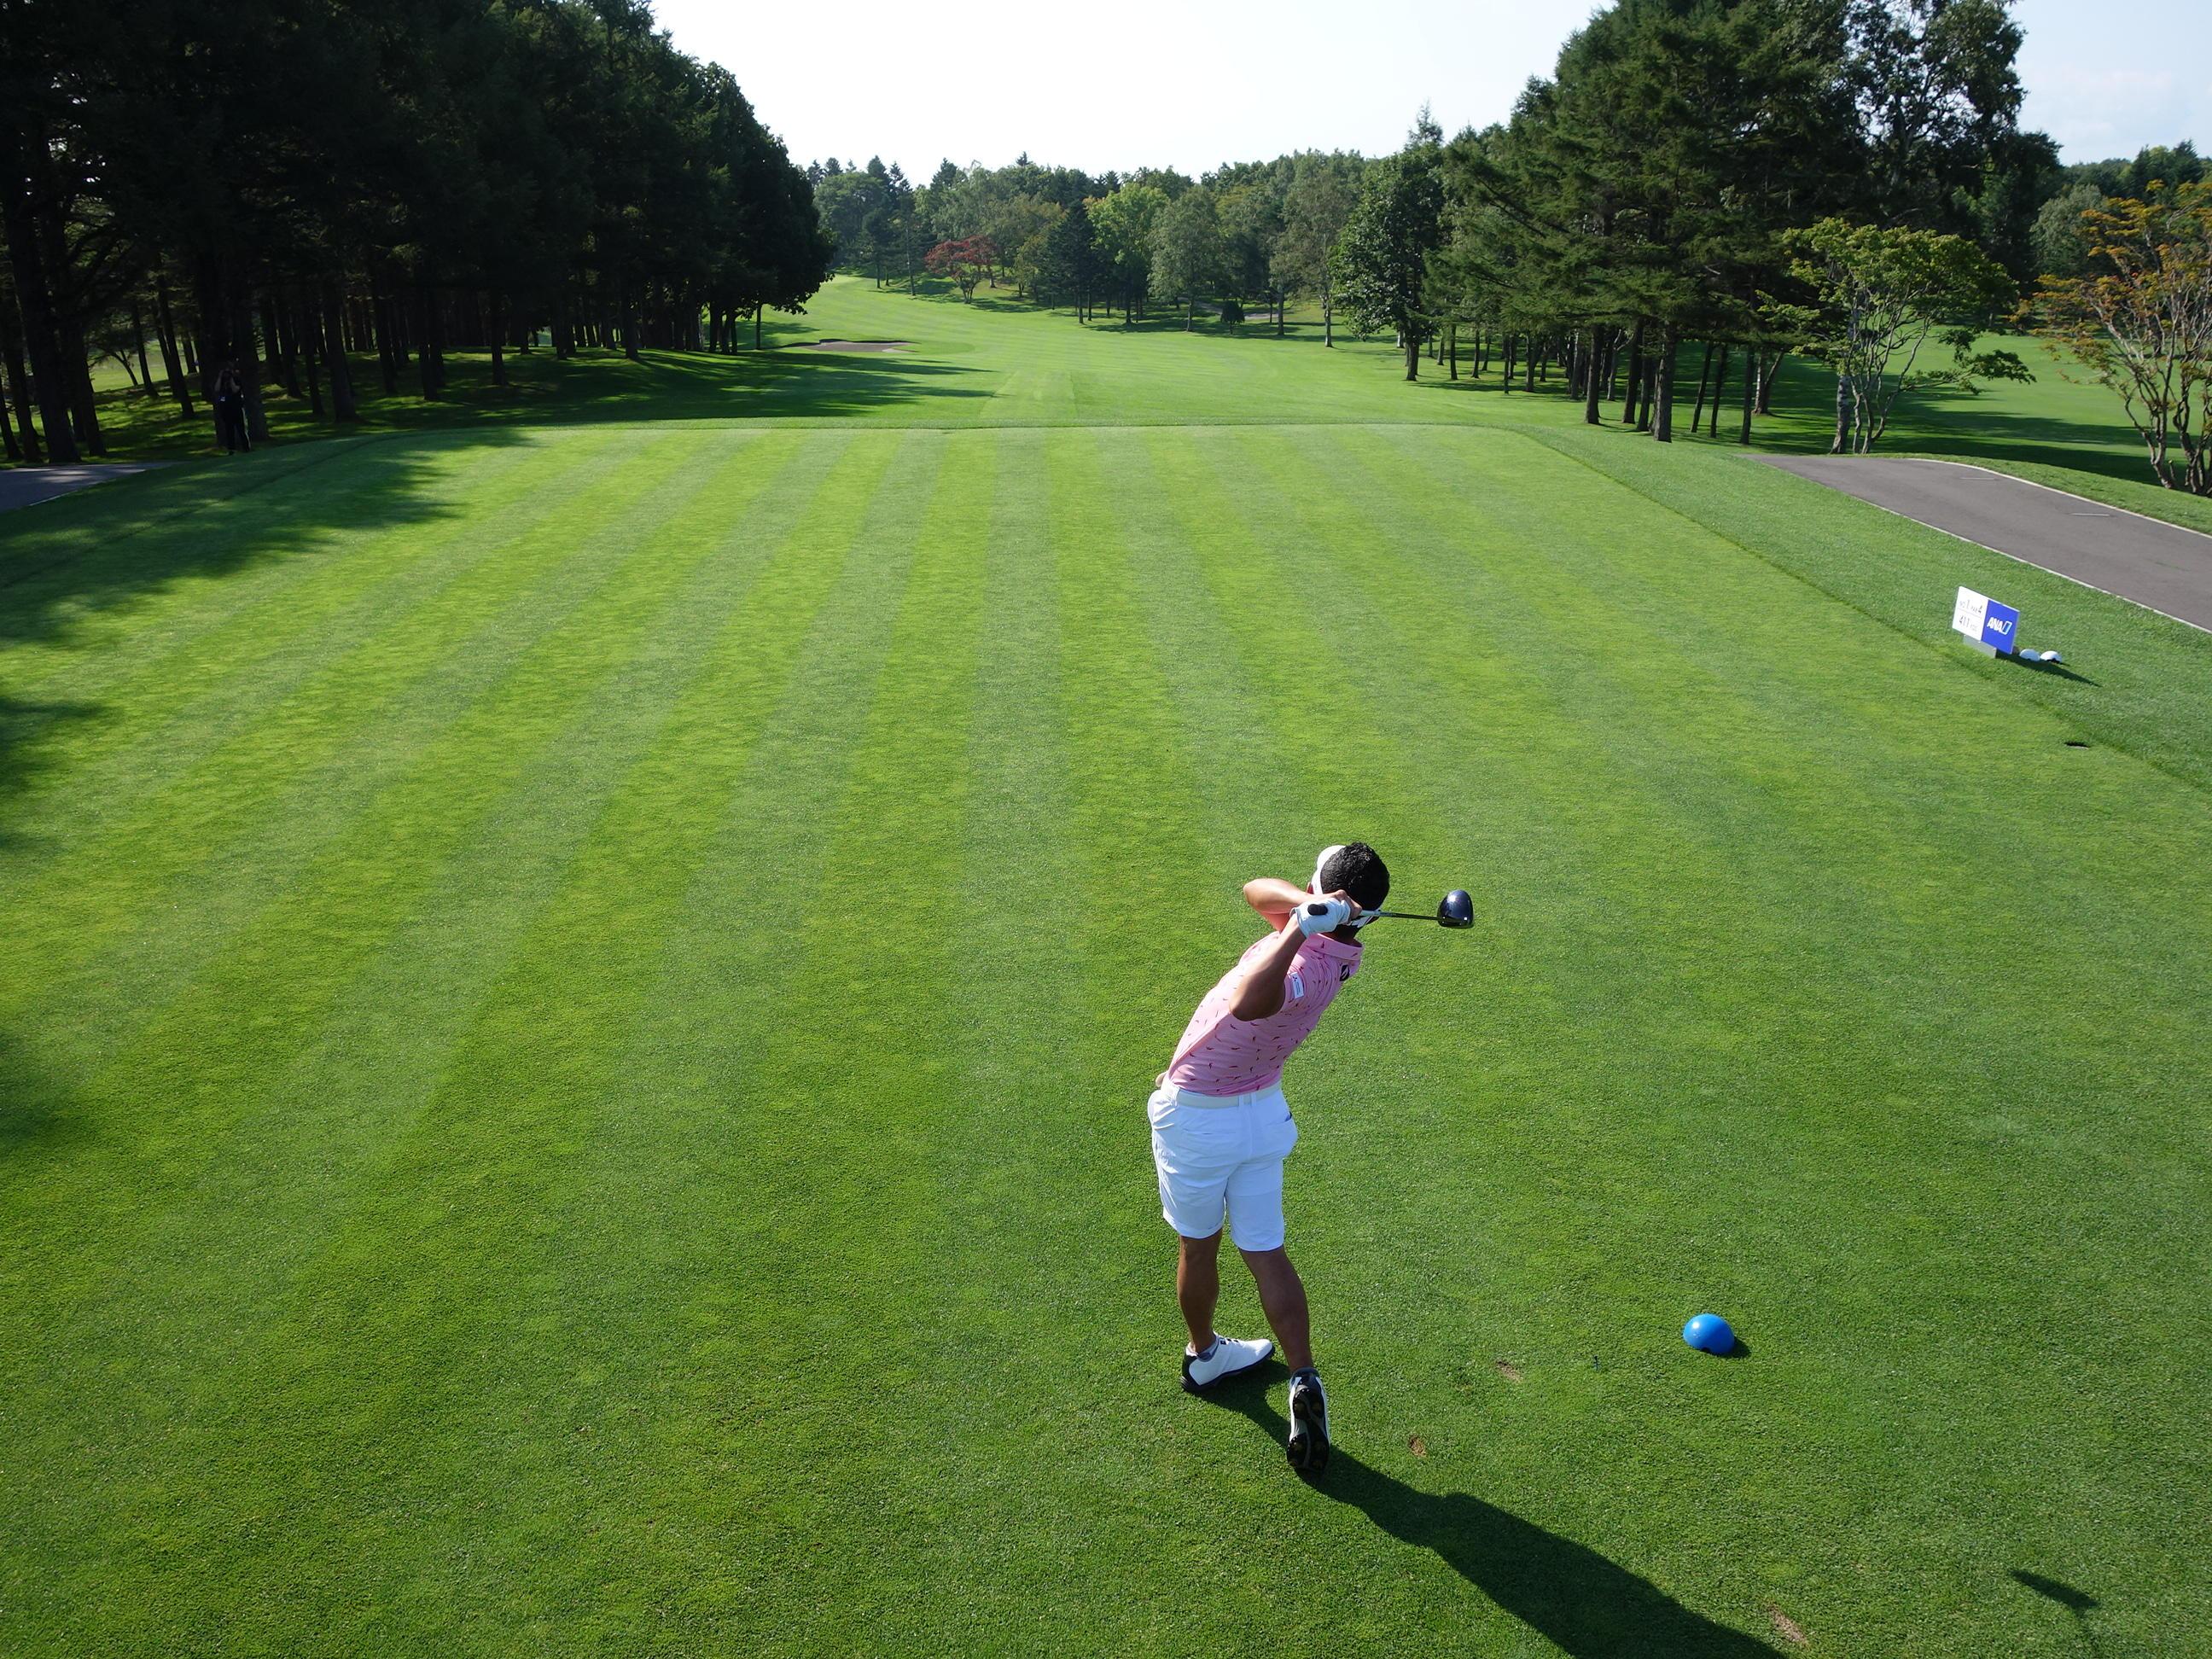 https://www.bs-golf.com/pro/cfcdfb8a1197211ee98fb4715fde806cf359b9eb.JPG